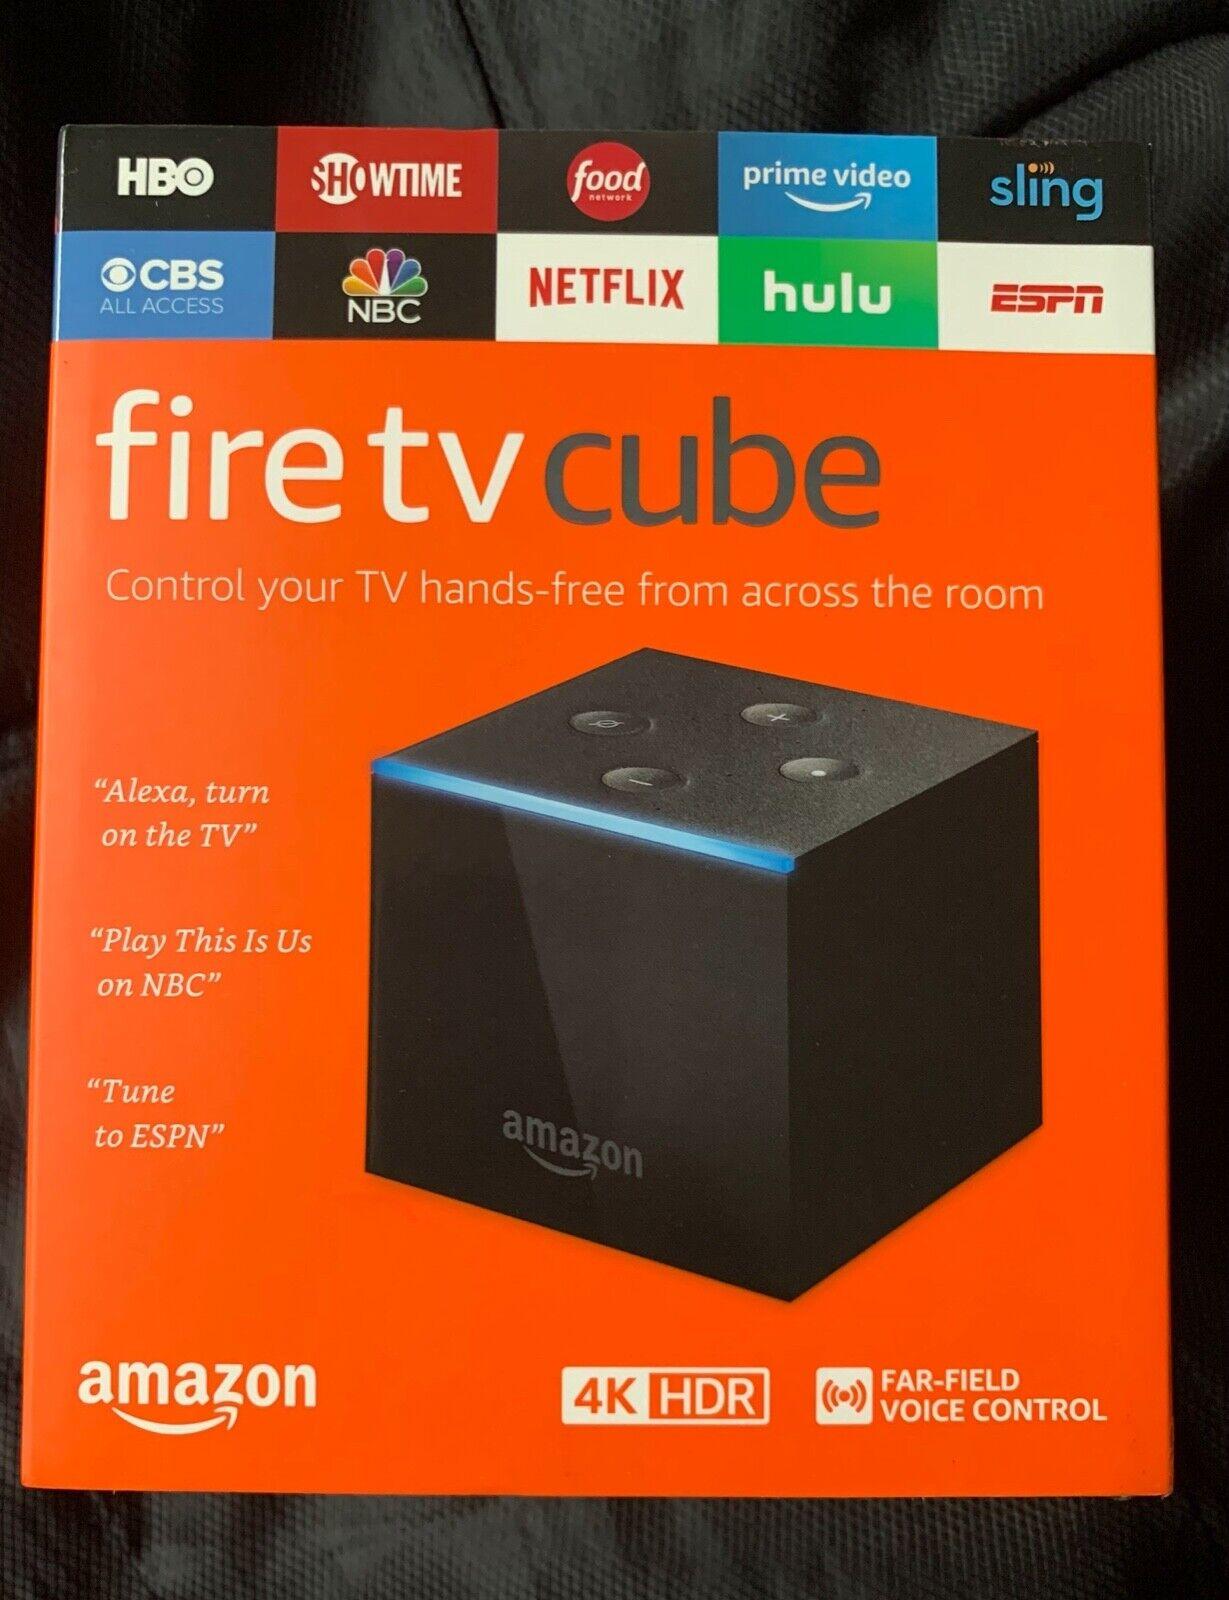 Fire TV Cube - 4K Ultra HD Streaming Media Player - Alexa Voice Remote - NEW alexa cube fire media new player remote streaming ultra voice